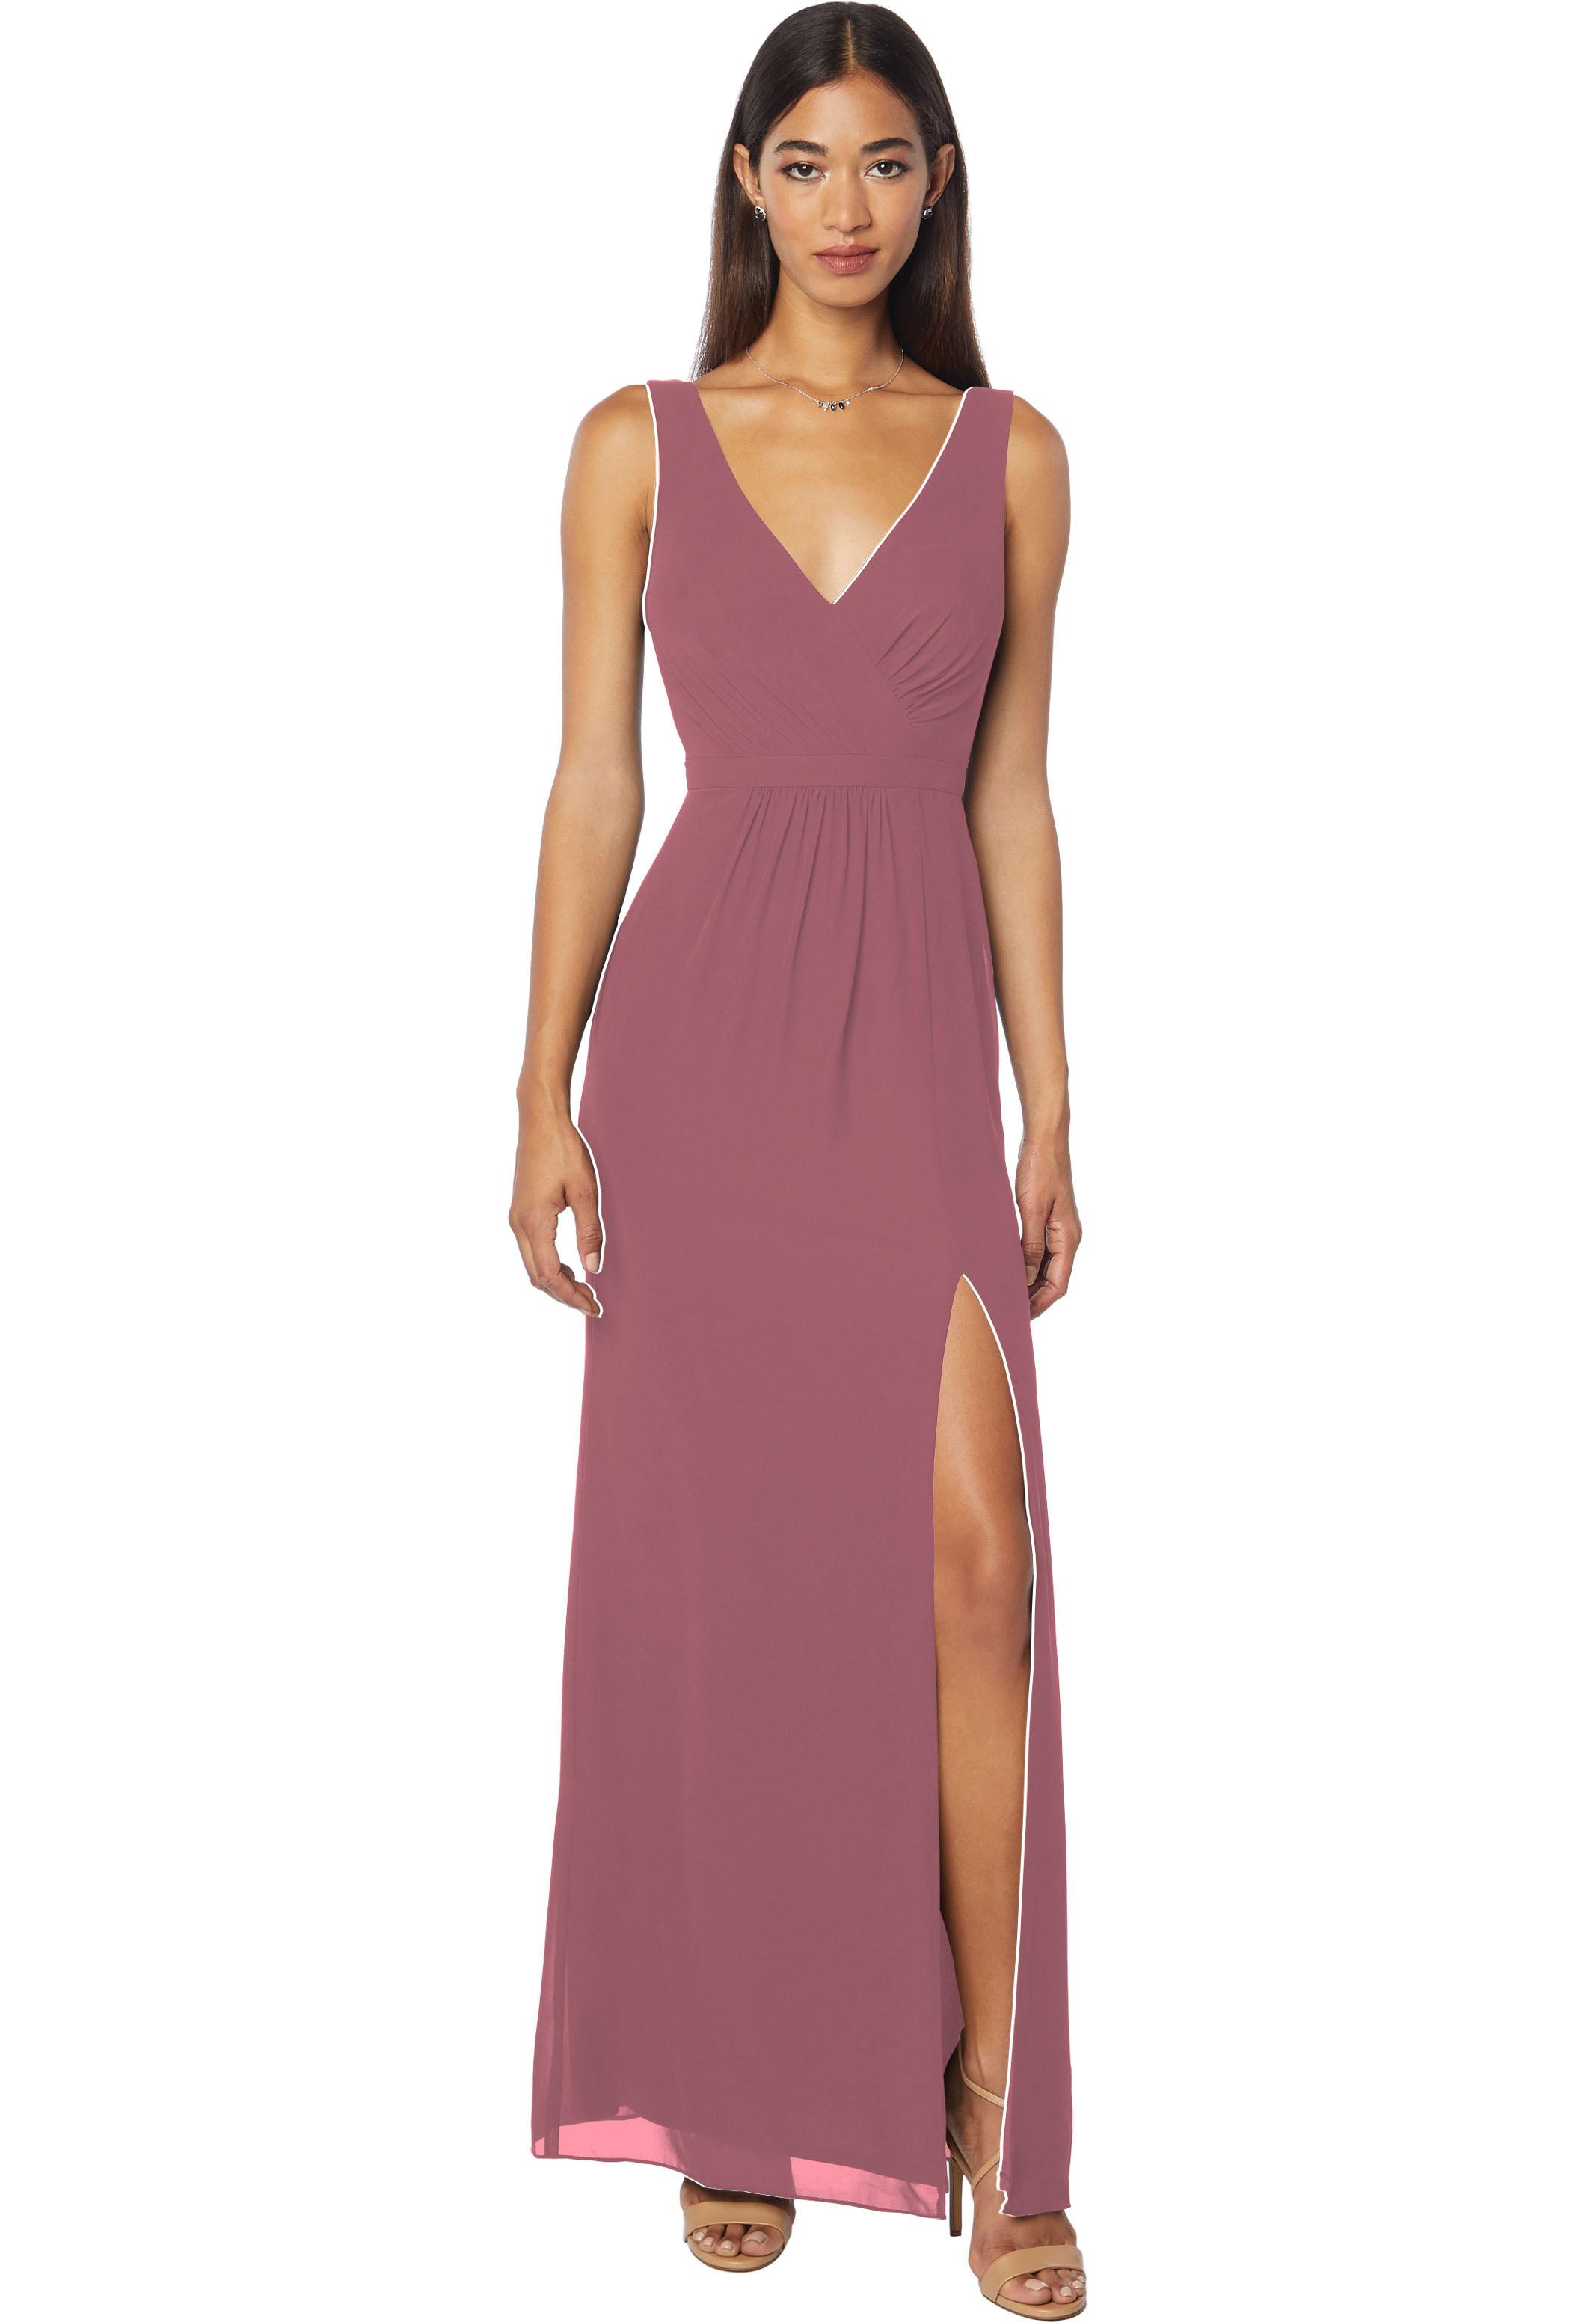 Bill Levkoff ROSEWOOD Chiffon Sleeveless Natural Waist gown, $178.00 Front